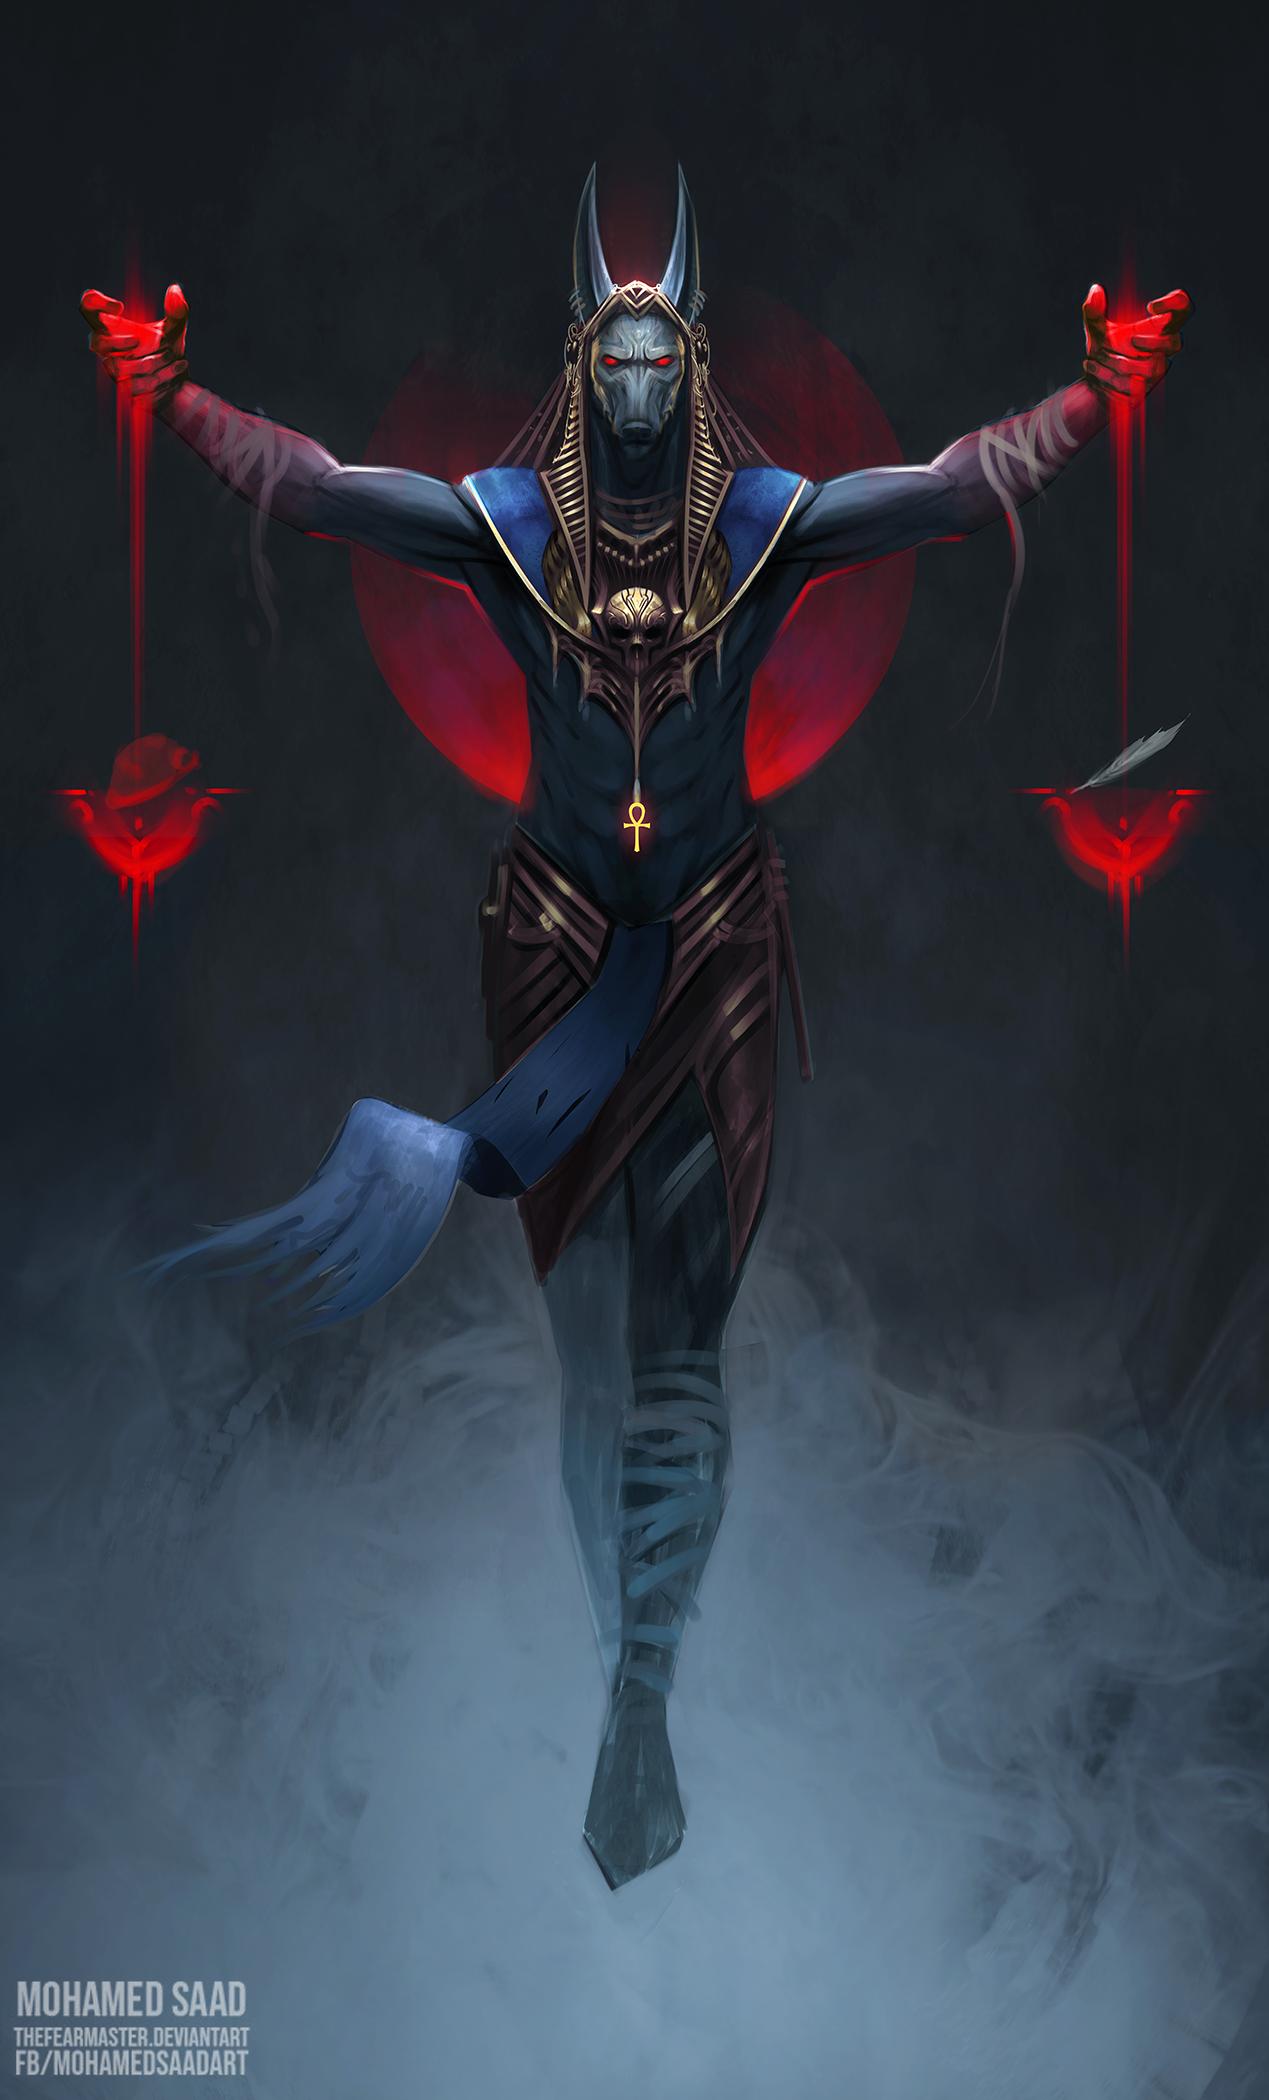 Anubis - Judge of the dead